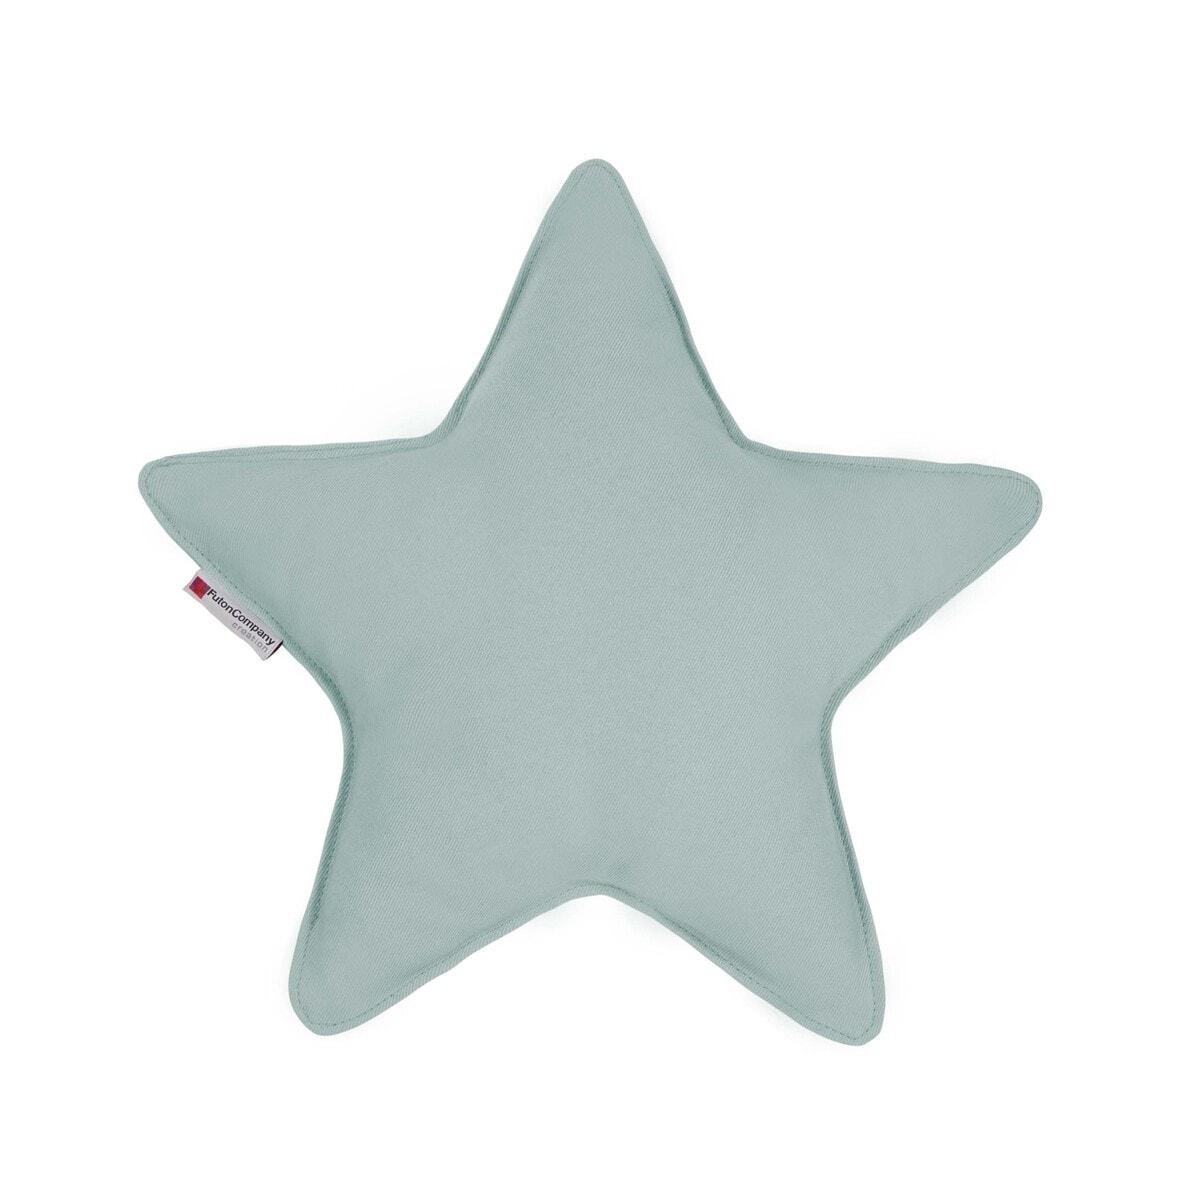 Almofada-Star-Sharp-M-Tecido-Lonita-Ice-01-okk